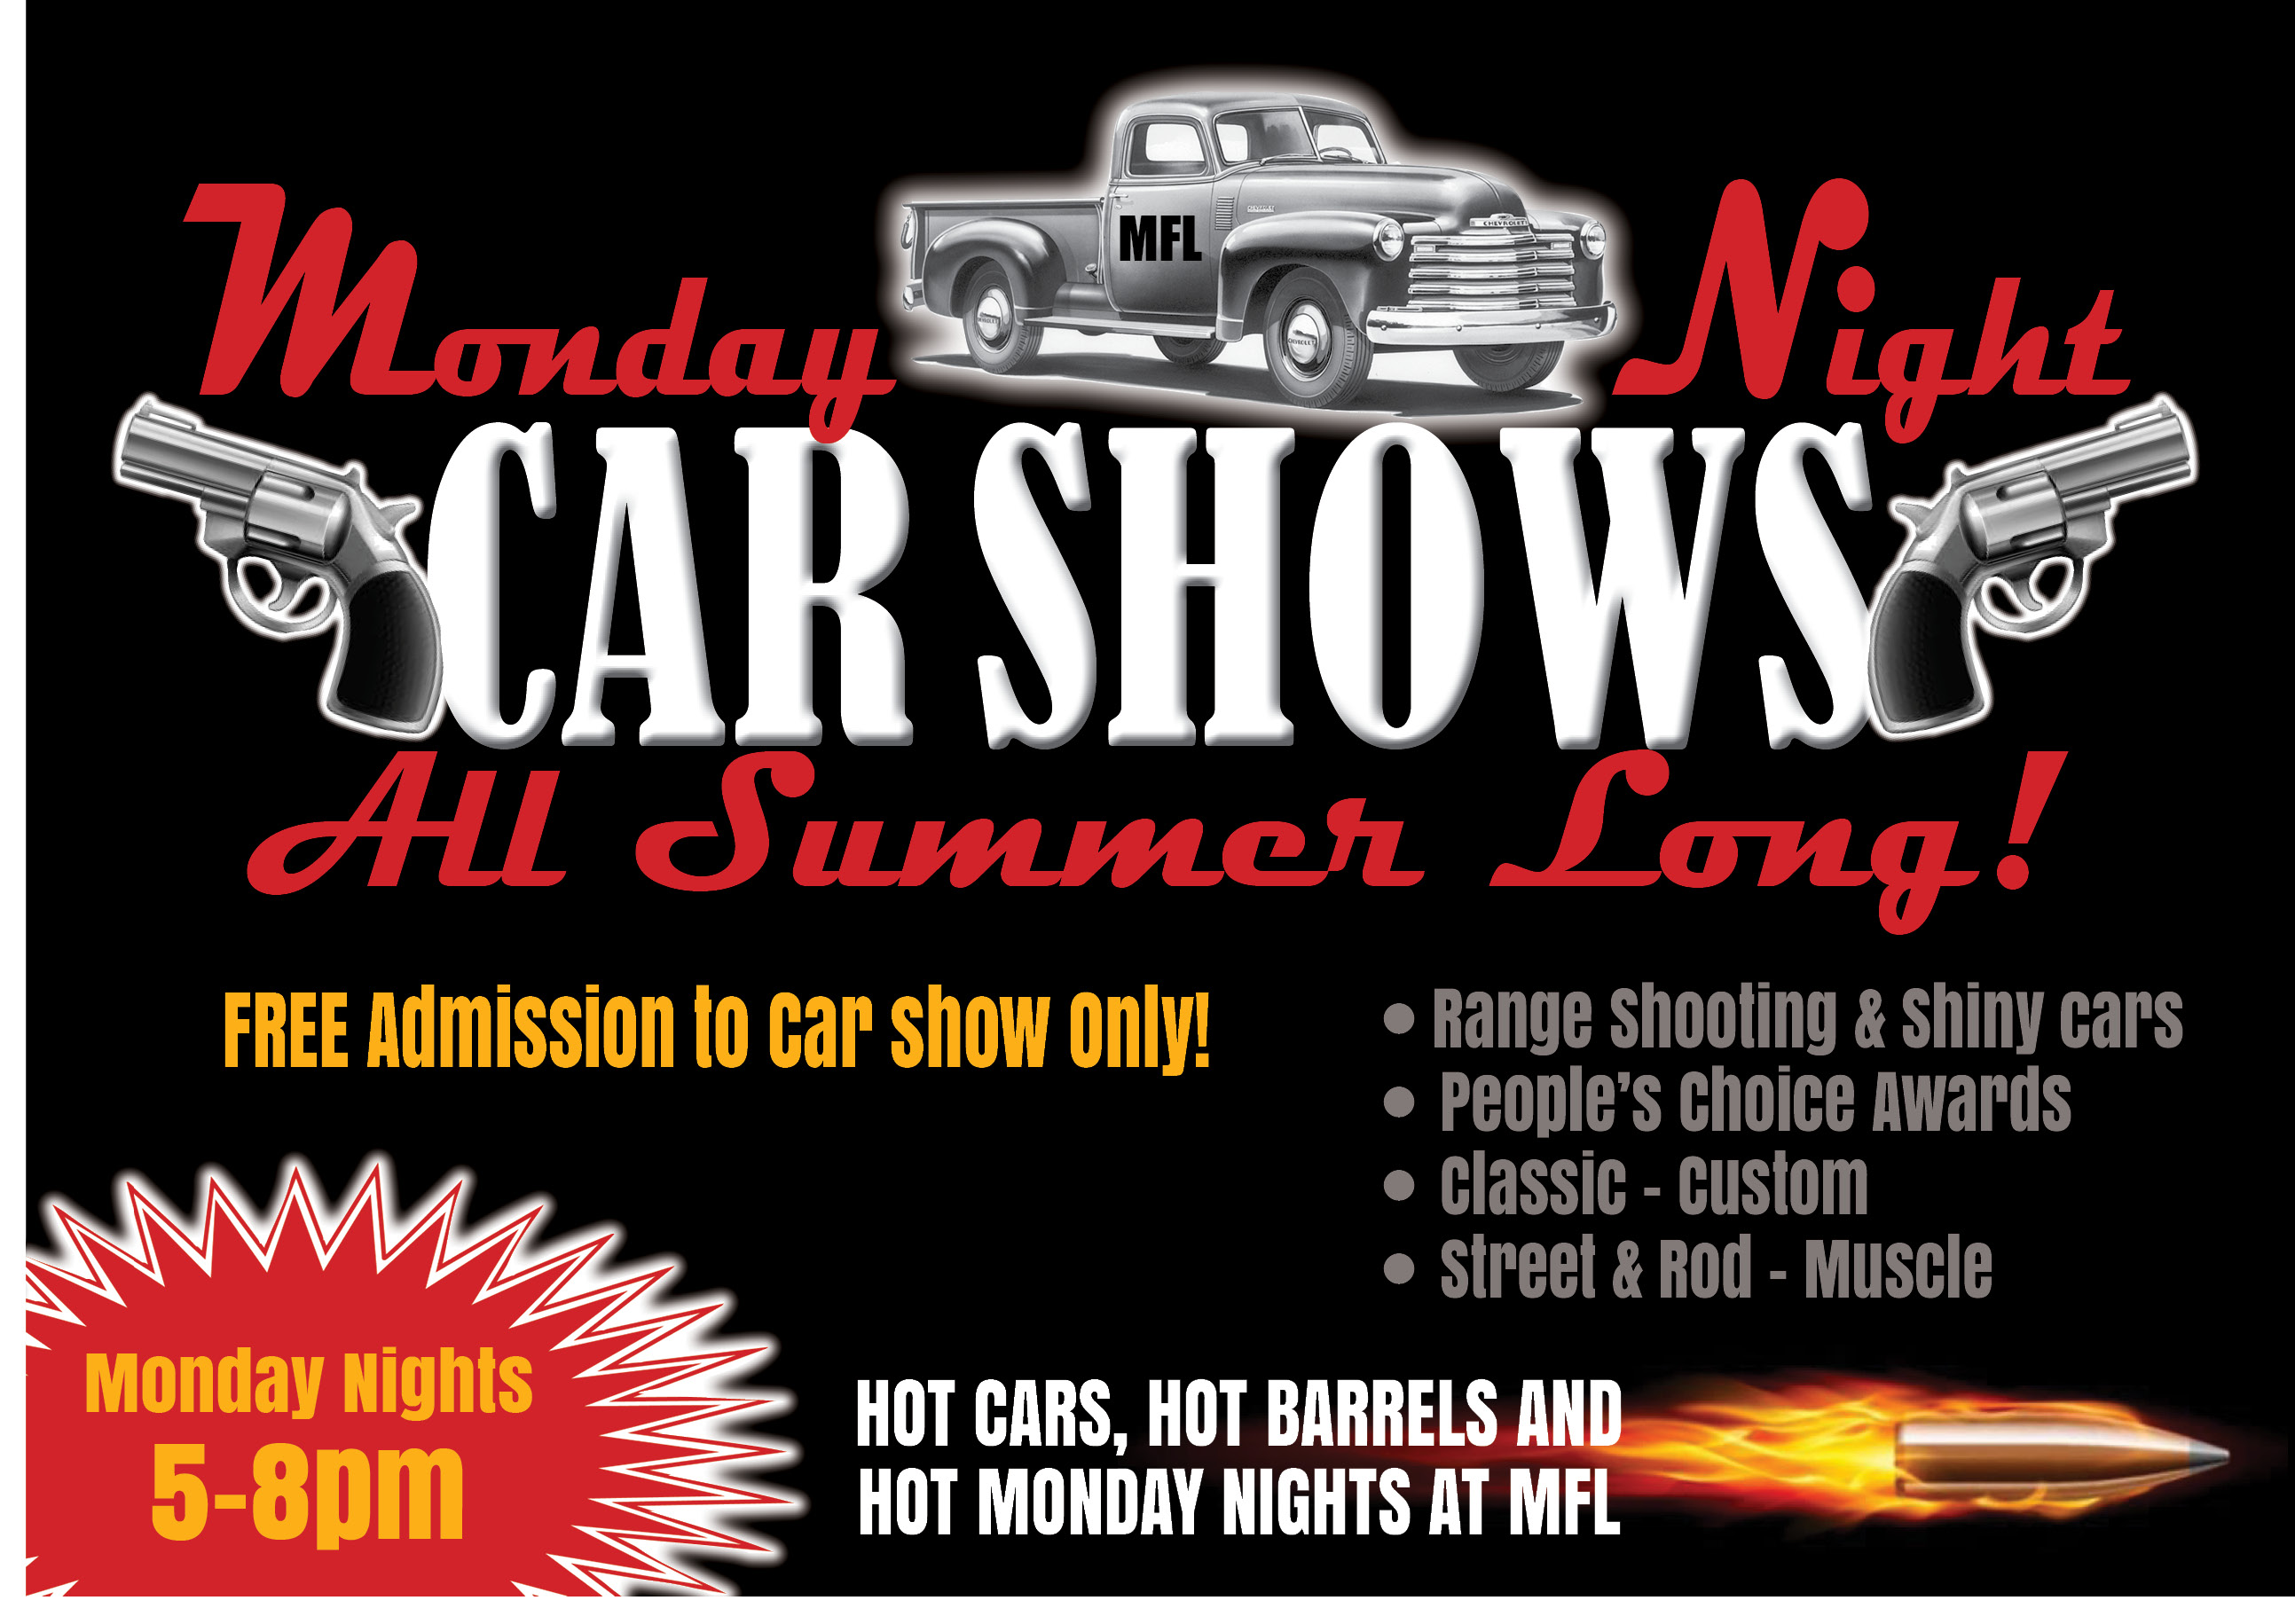 MFL_Monday Night Car Show OUTSIDE Sign Banner_Pixels.jpg